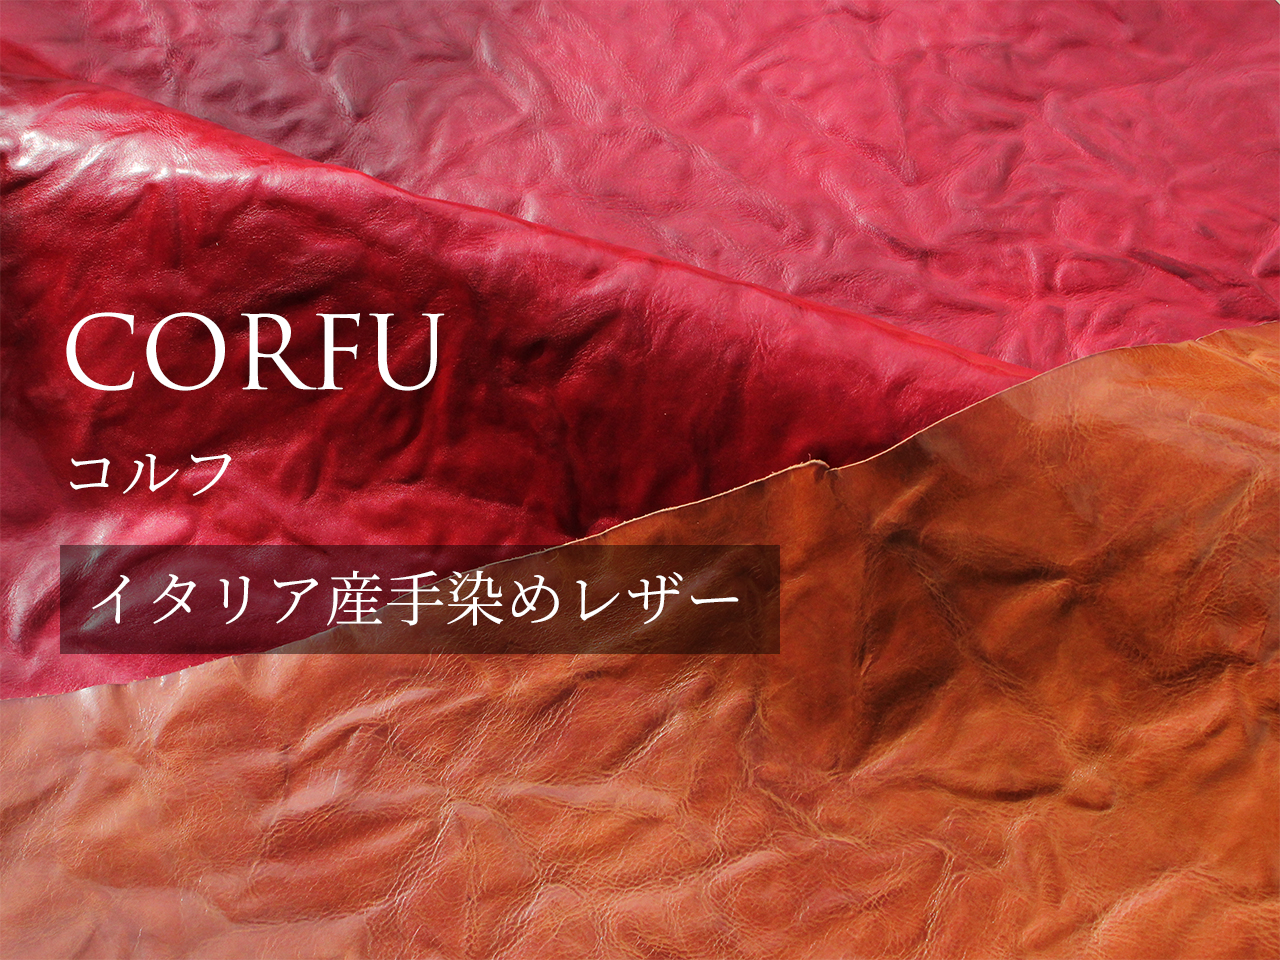 CORFU(コルフ)について